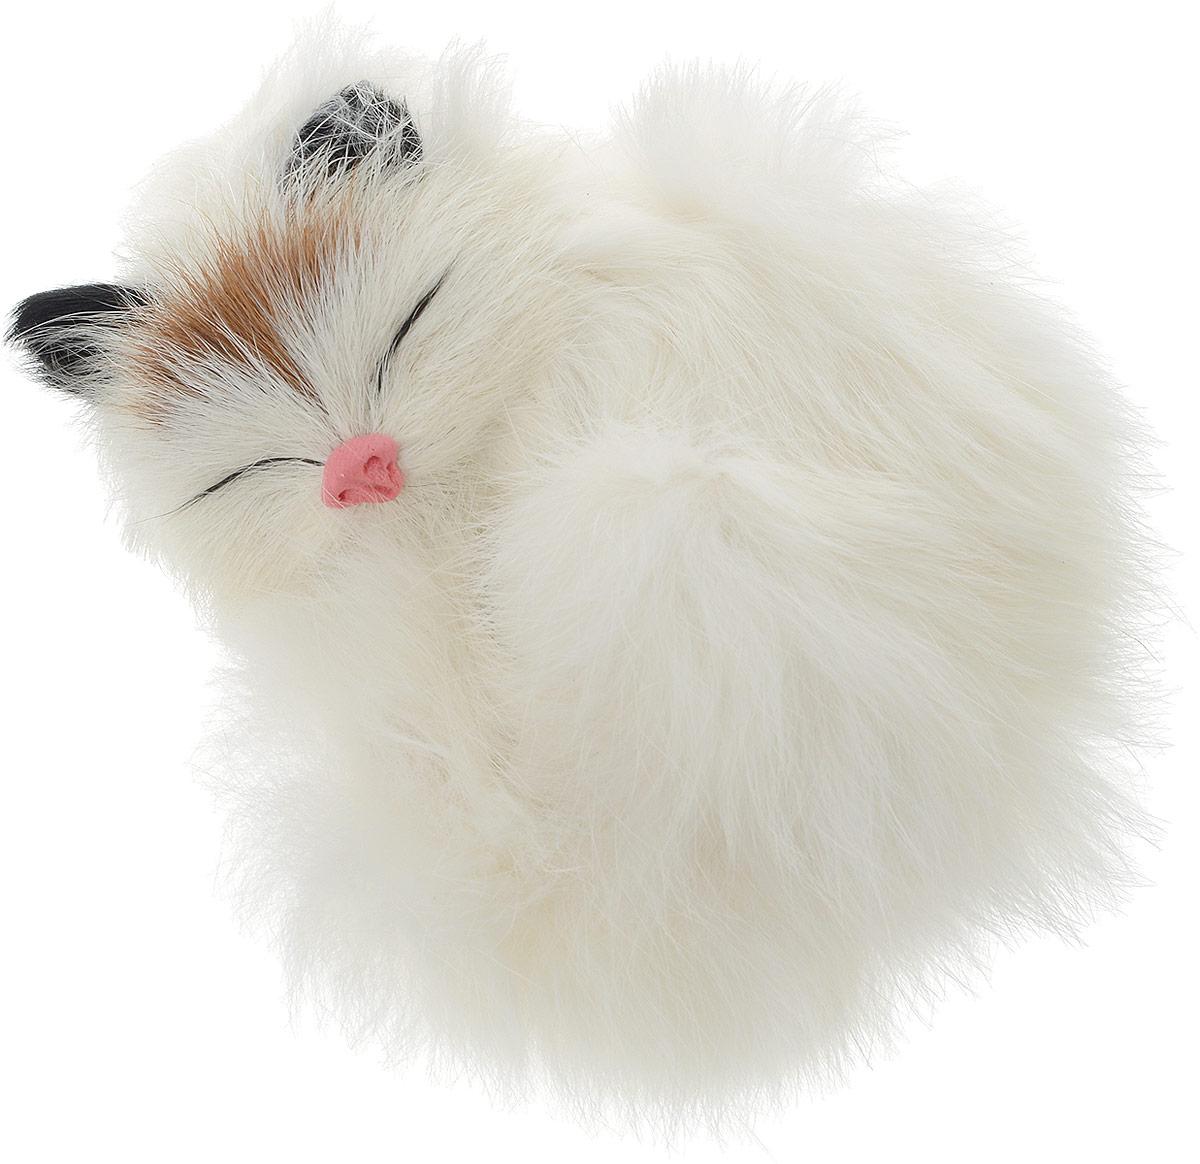 Vebtoy Фигурка Котенок в клубочке цвет белый C225 vebtoy фигурка котенок сидящий цвет белый c226